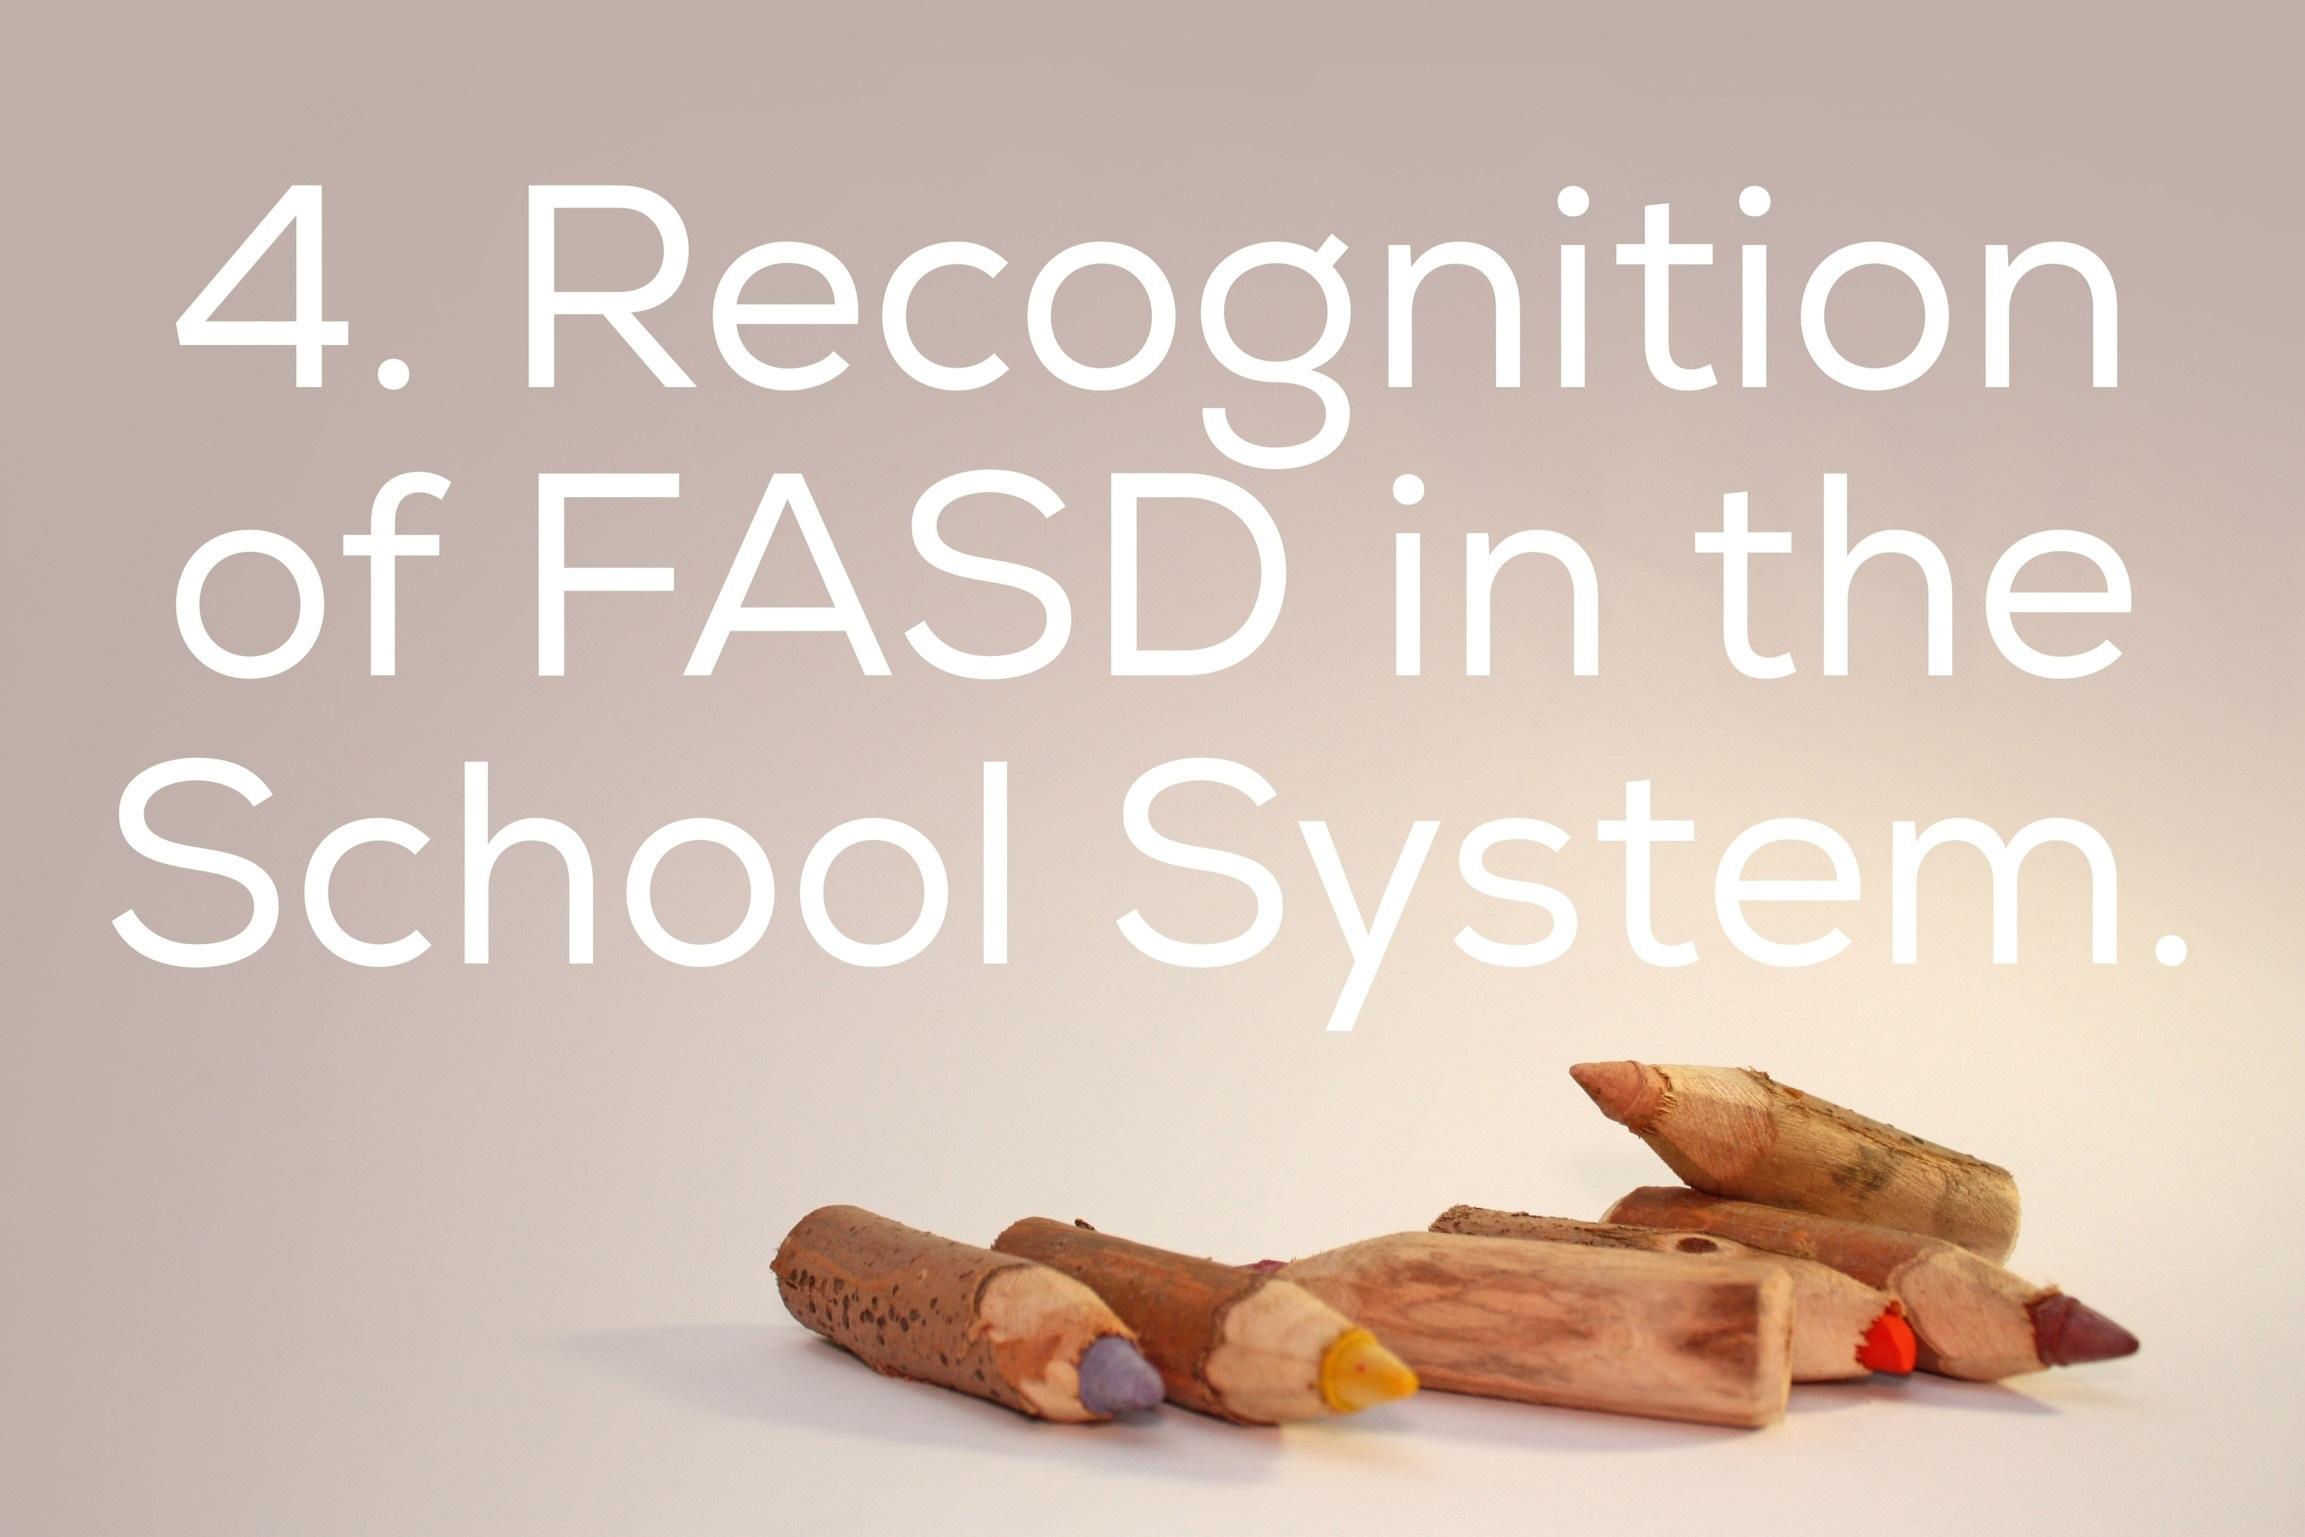 fasd-wishes-school